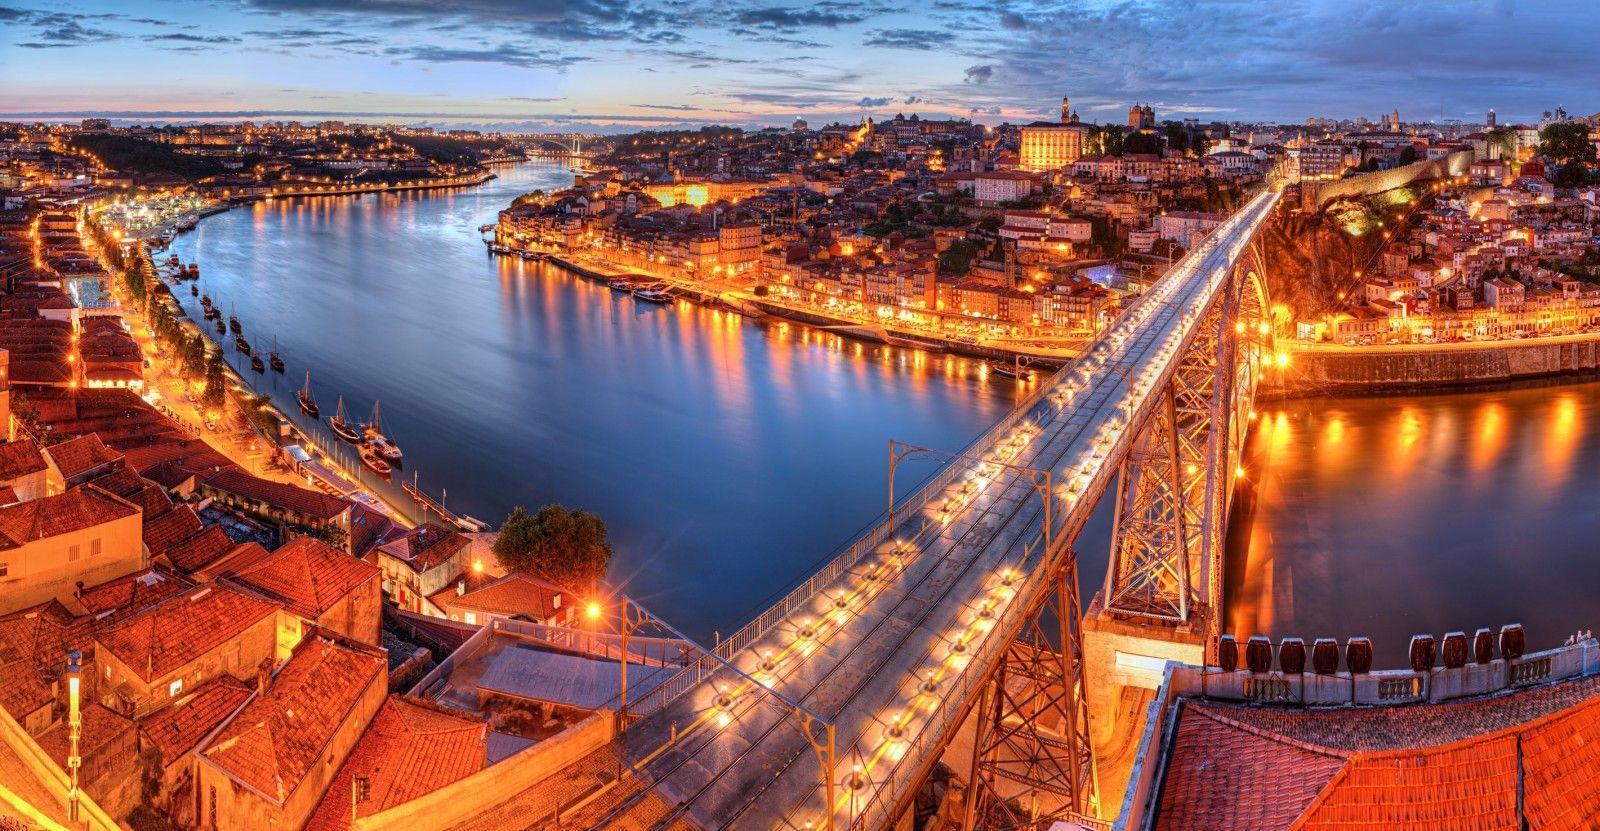 Porto Wallpaper | 1600x831 | ID:51610